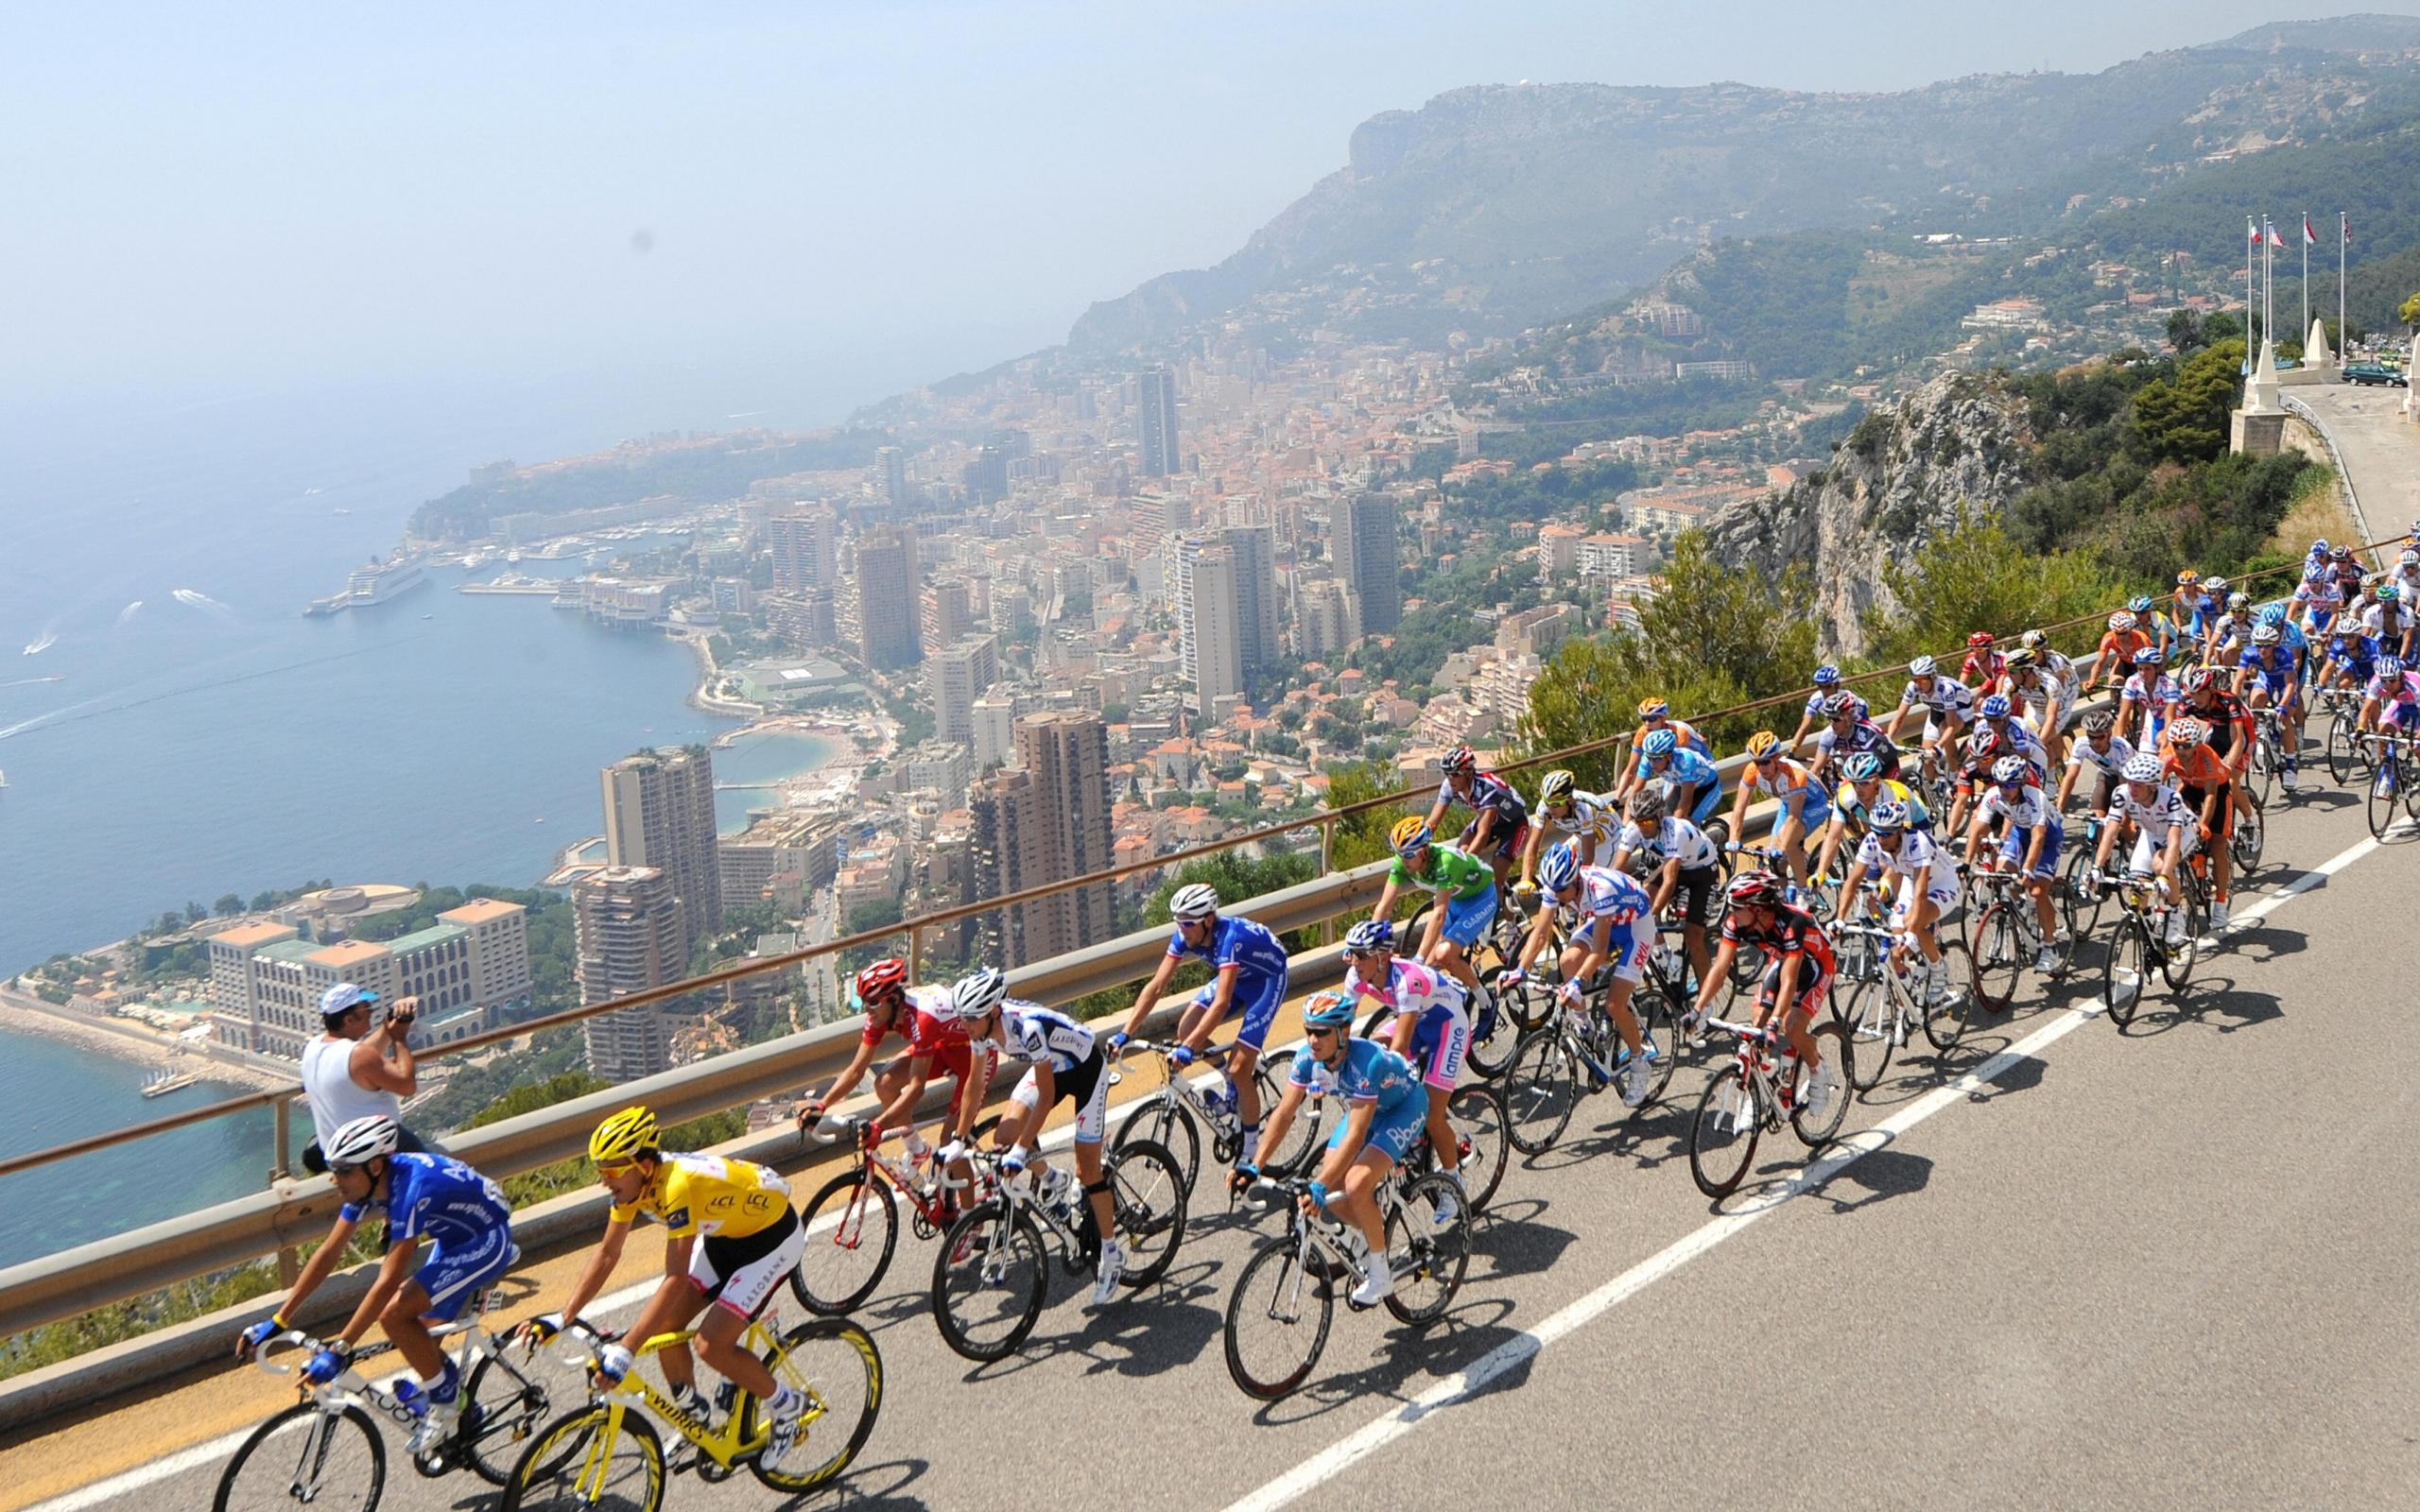 cycling tour de france 4256x2832 wallpaper Art HD Wallpaper download 2560x1600